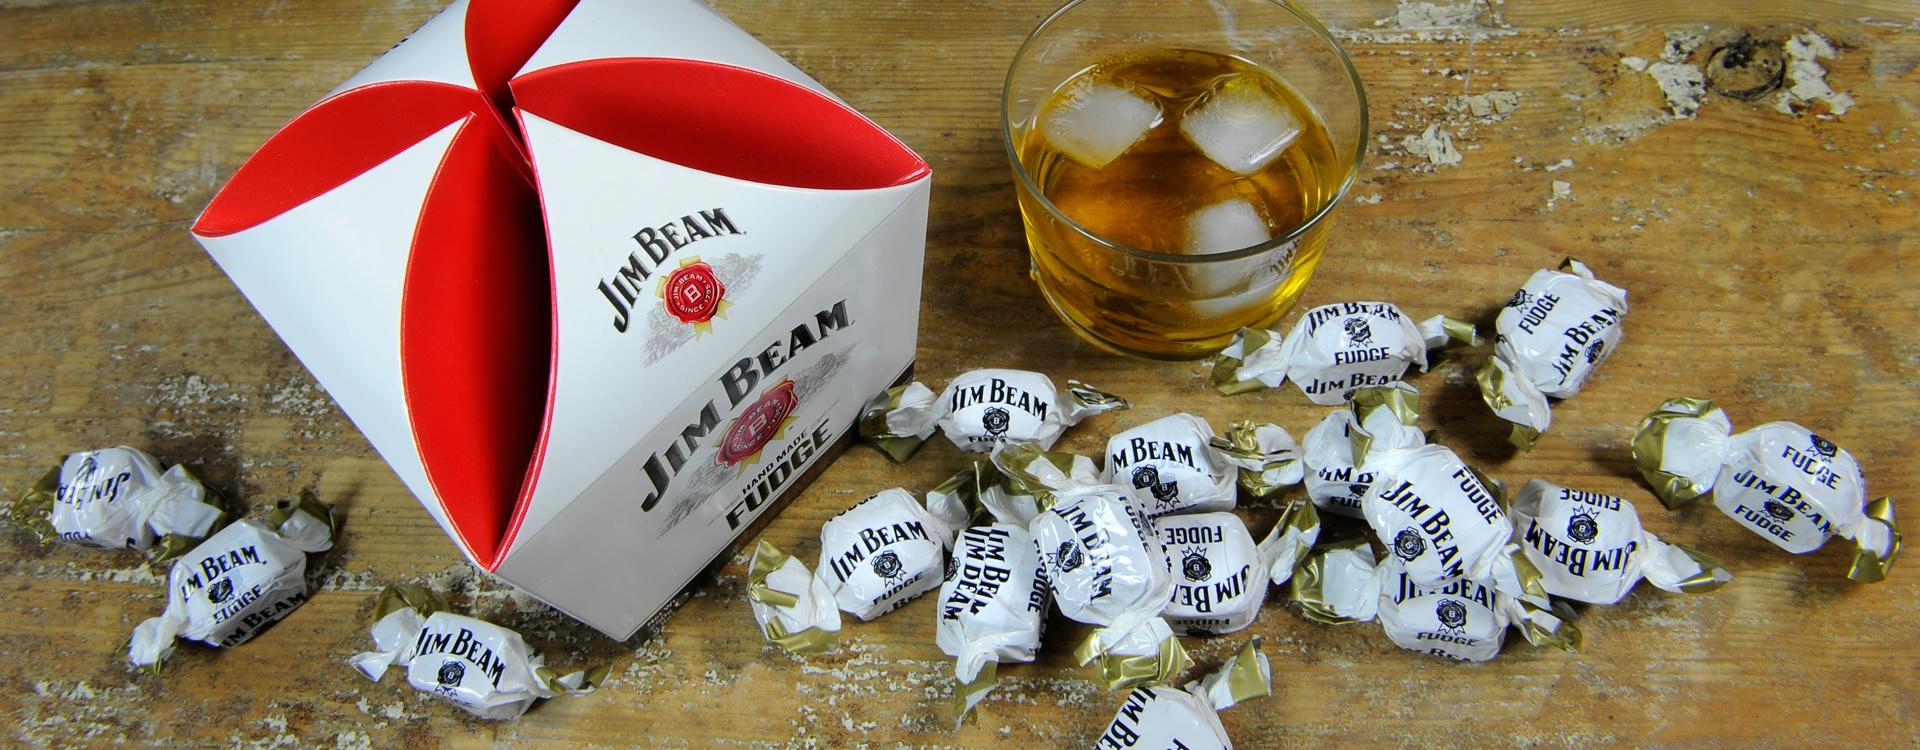 Top Food Feinkost - Gardiners of Scotland -Whisky Fudge Jim Beam